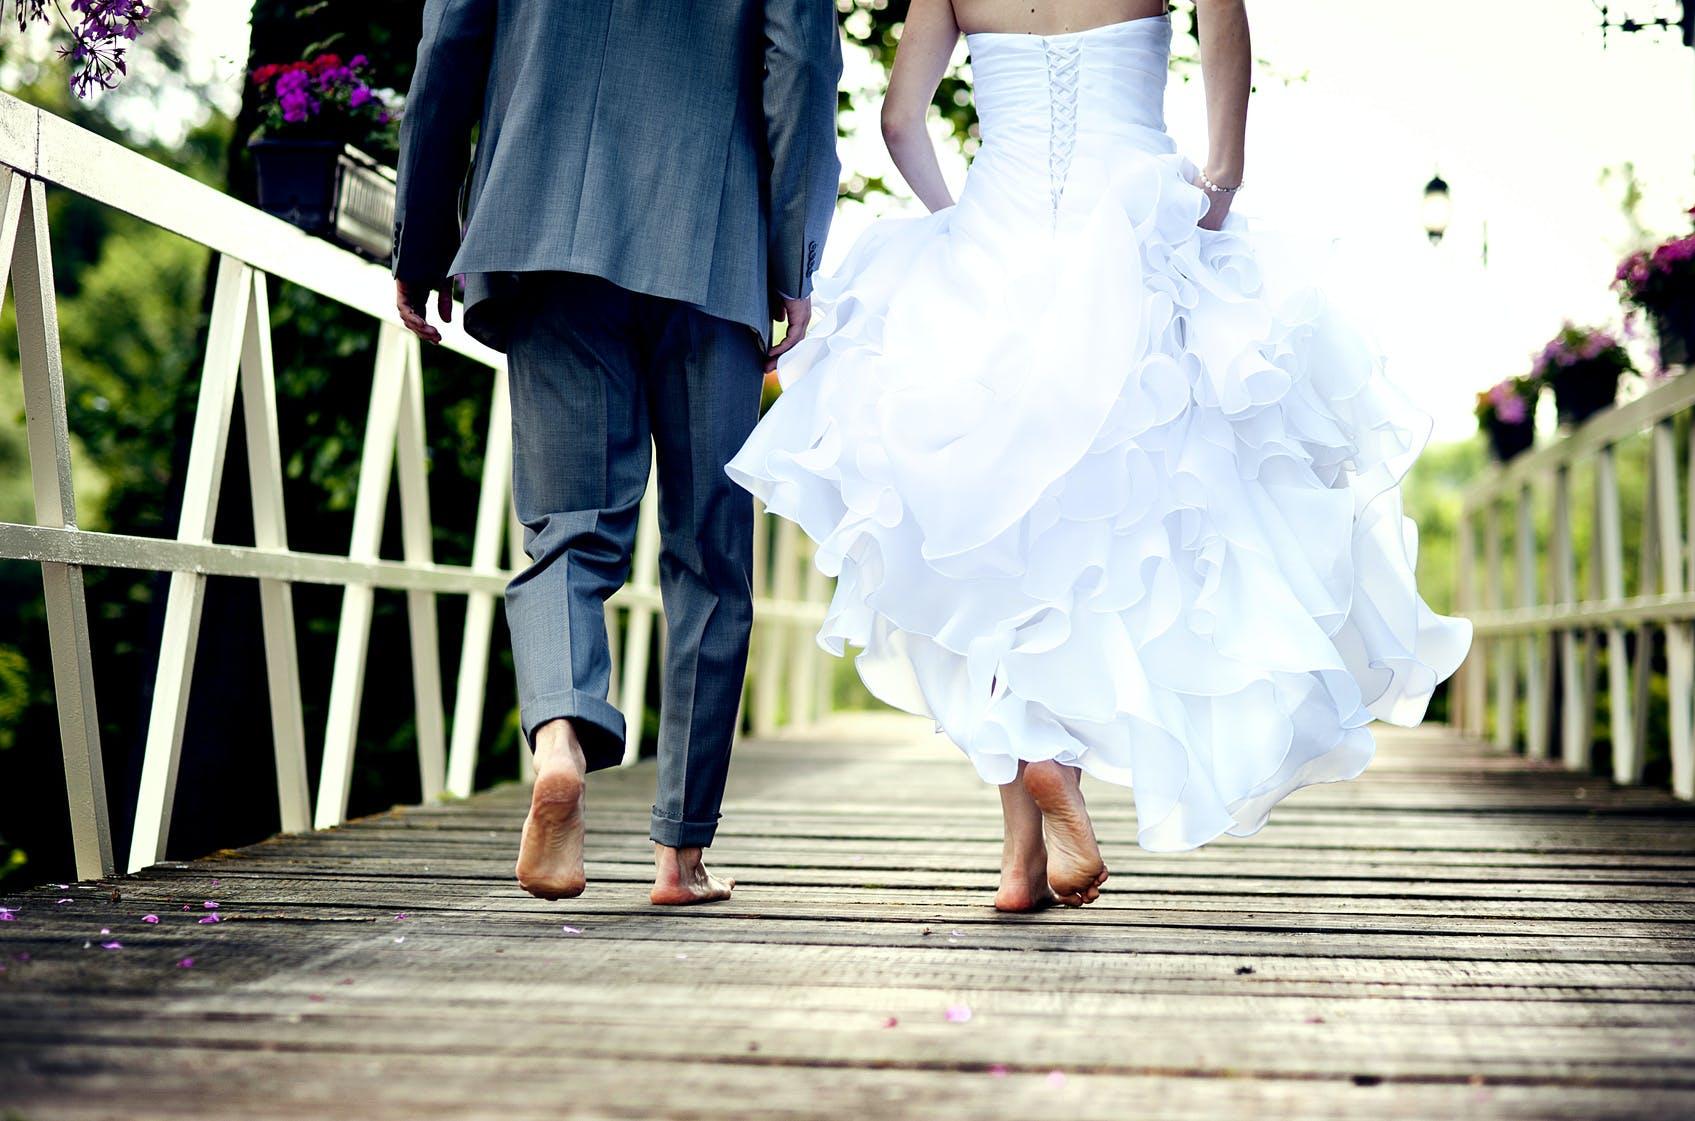 Marry দক্ষতা সহকারে